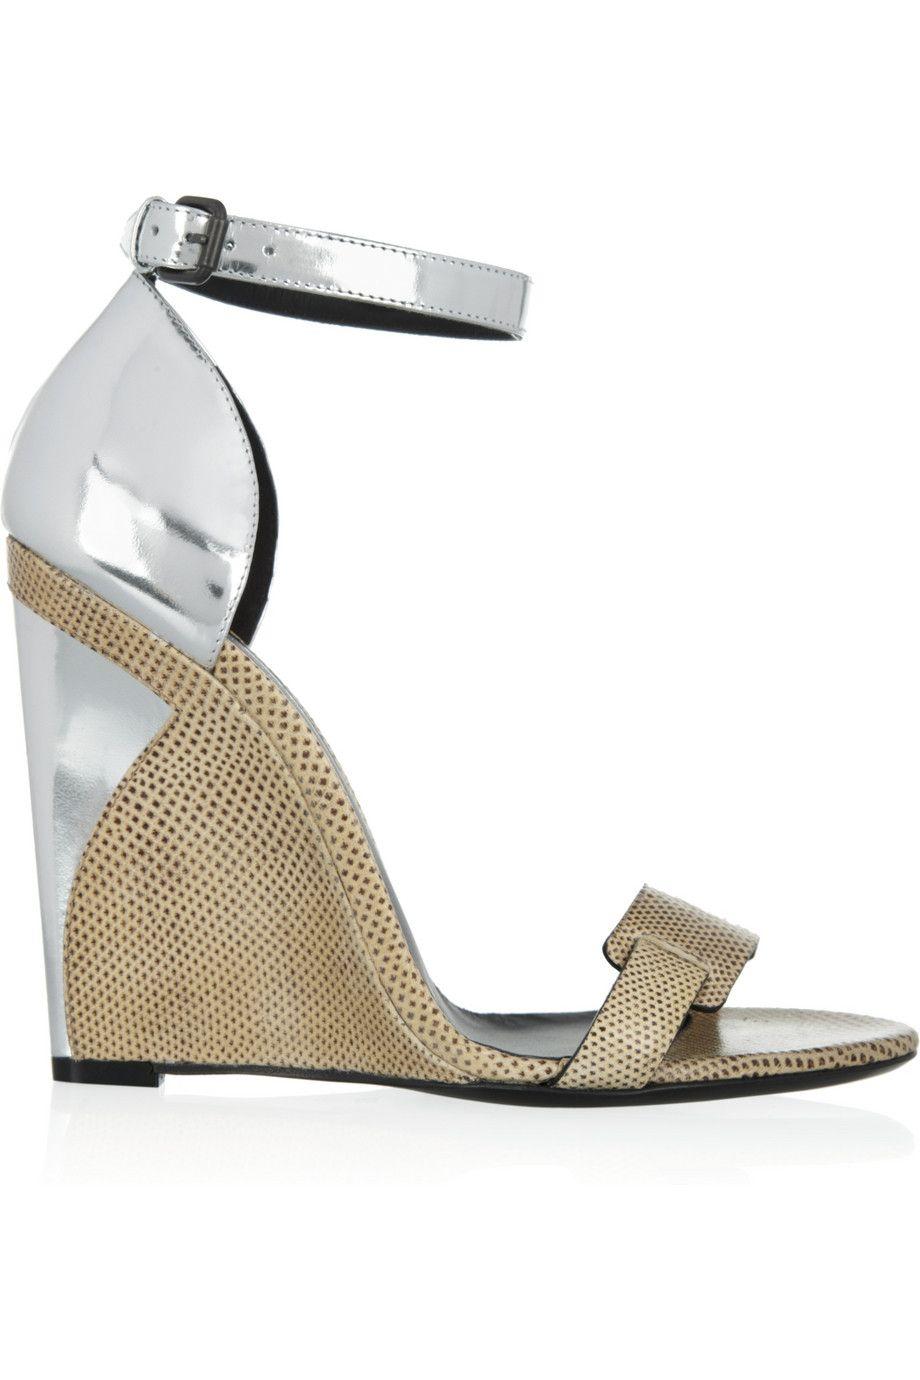 78c5e0c71a836 BOTTEGA VENETA Karung and metallic leather sandals